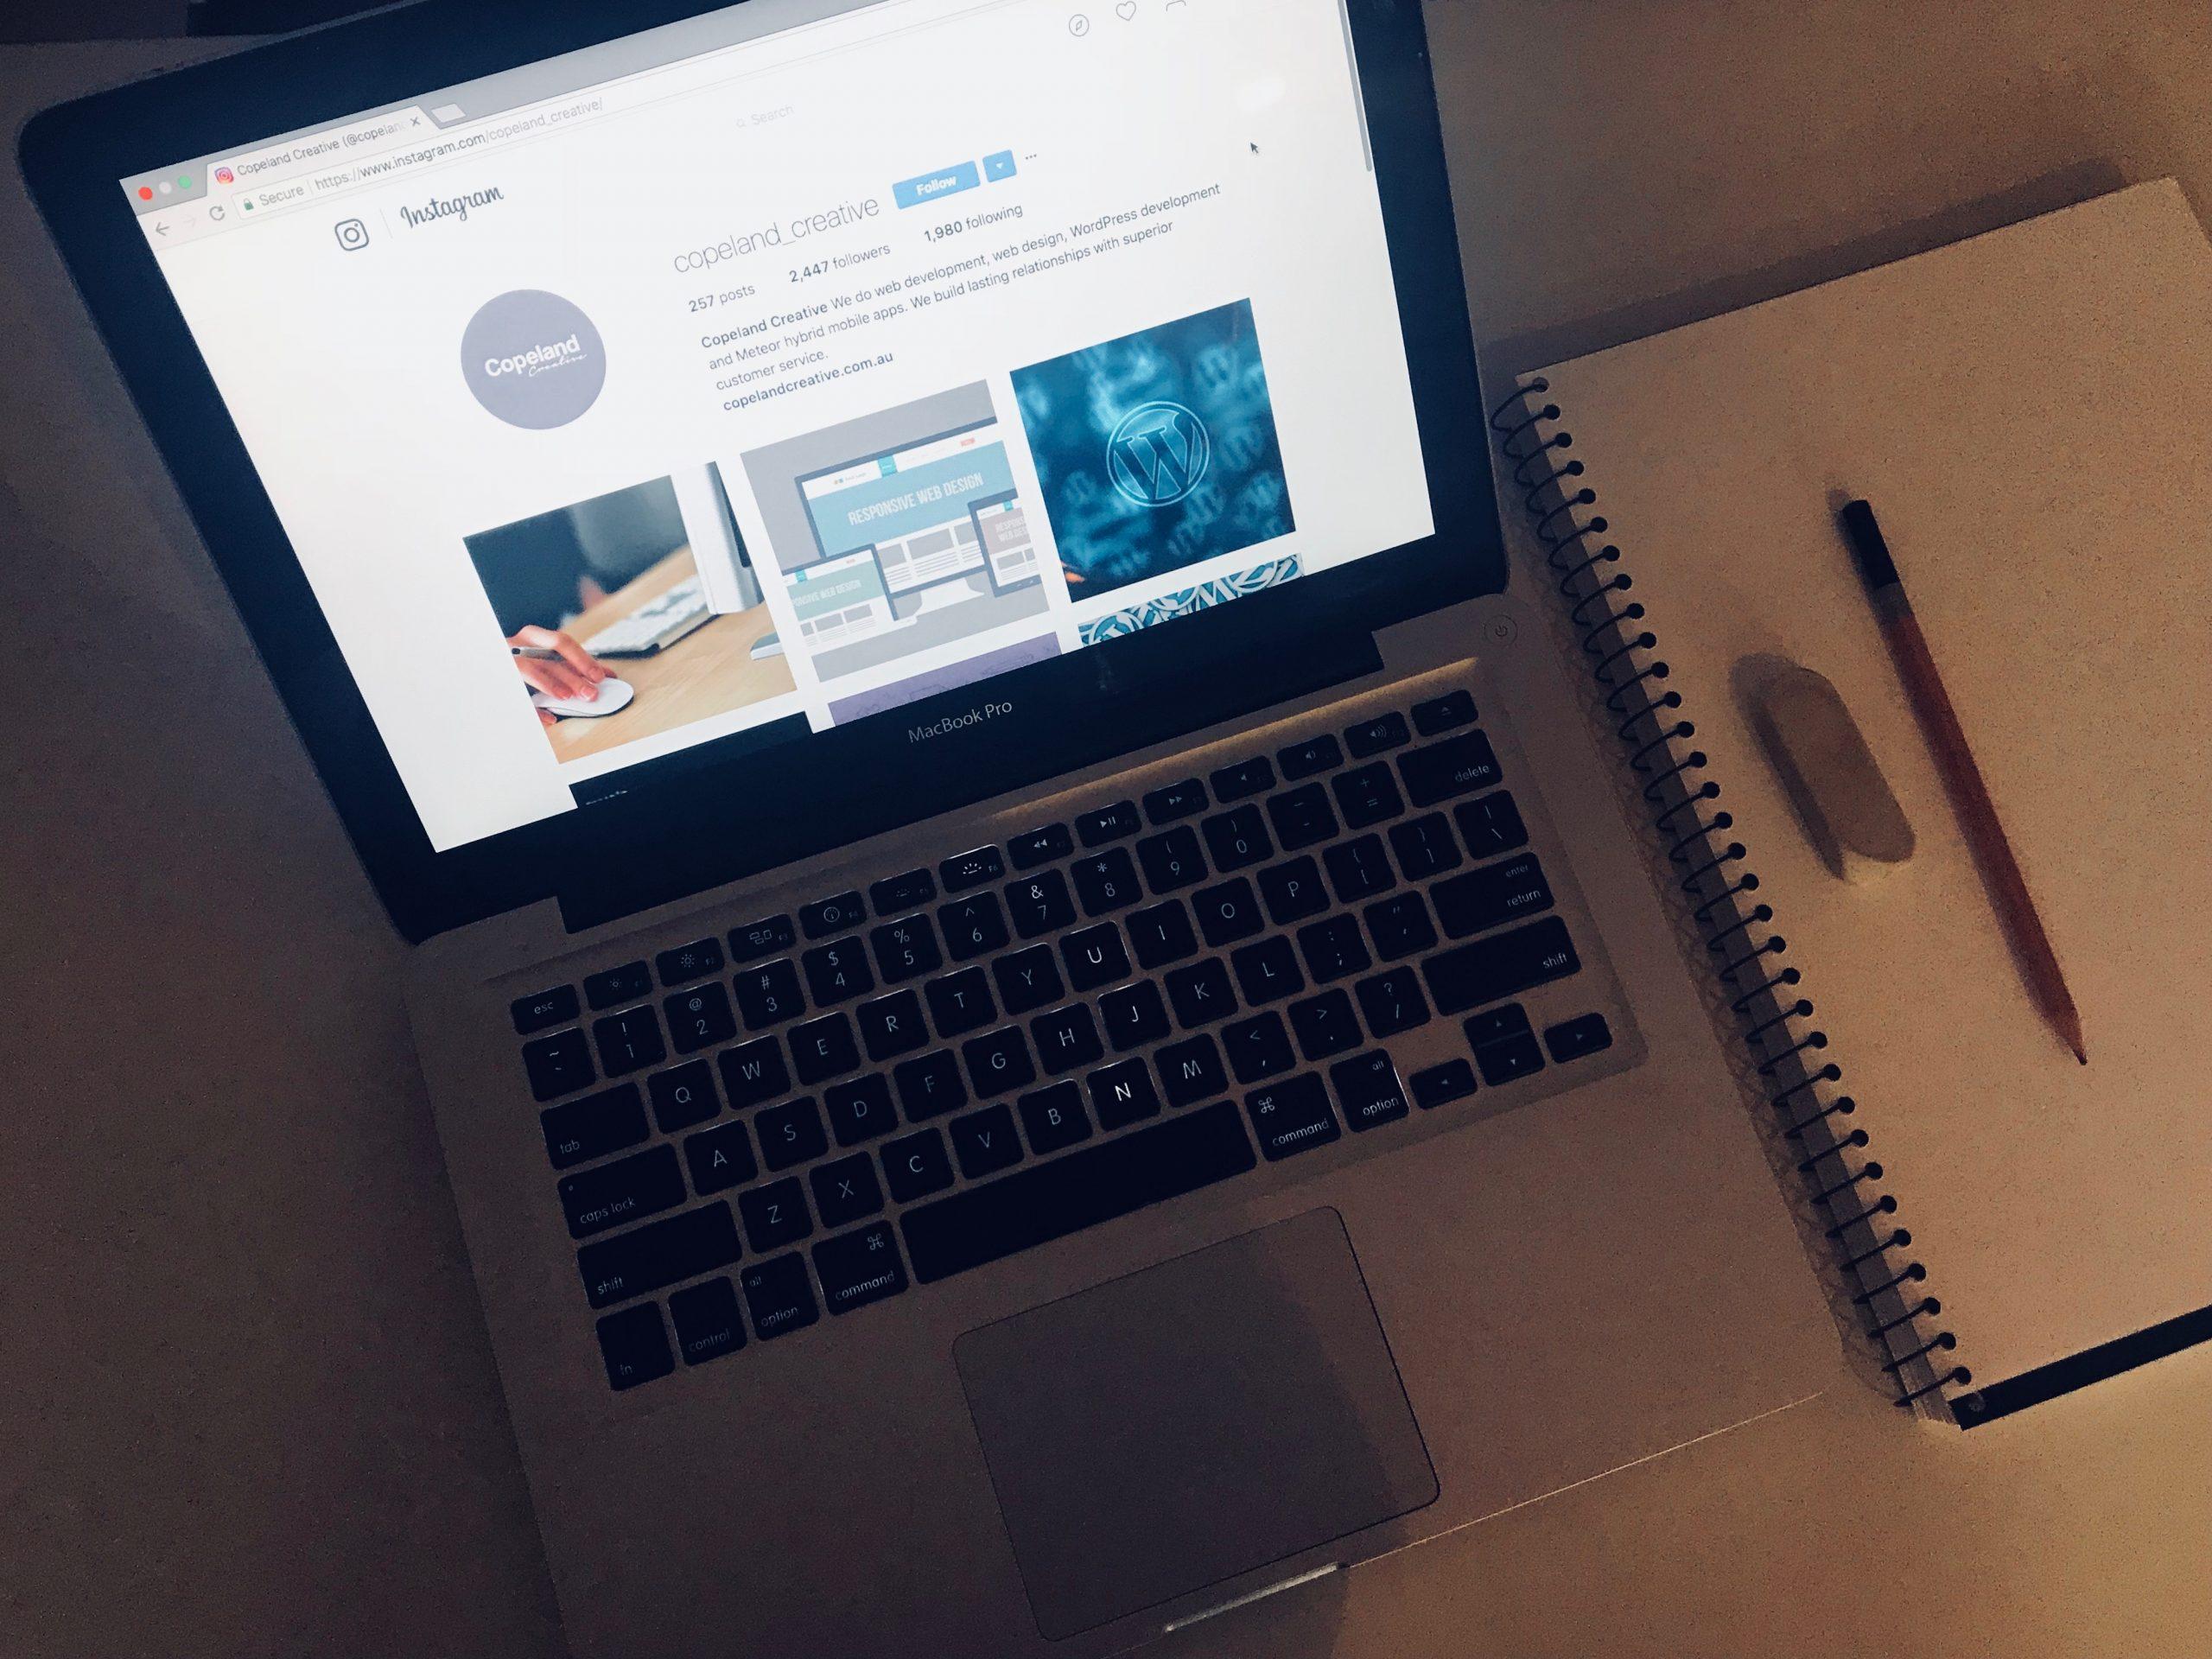 Instagram for business on laptop